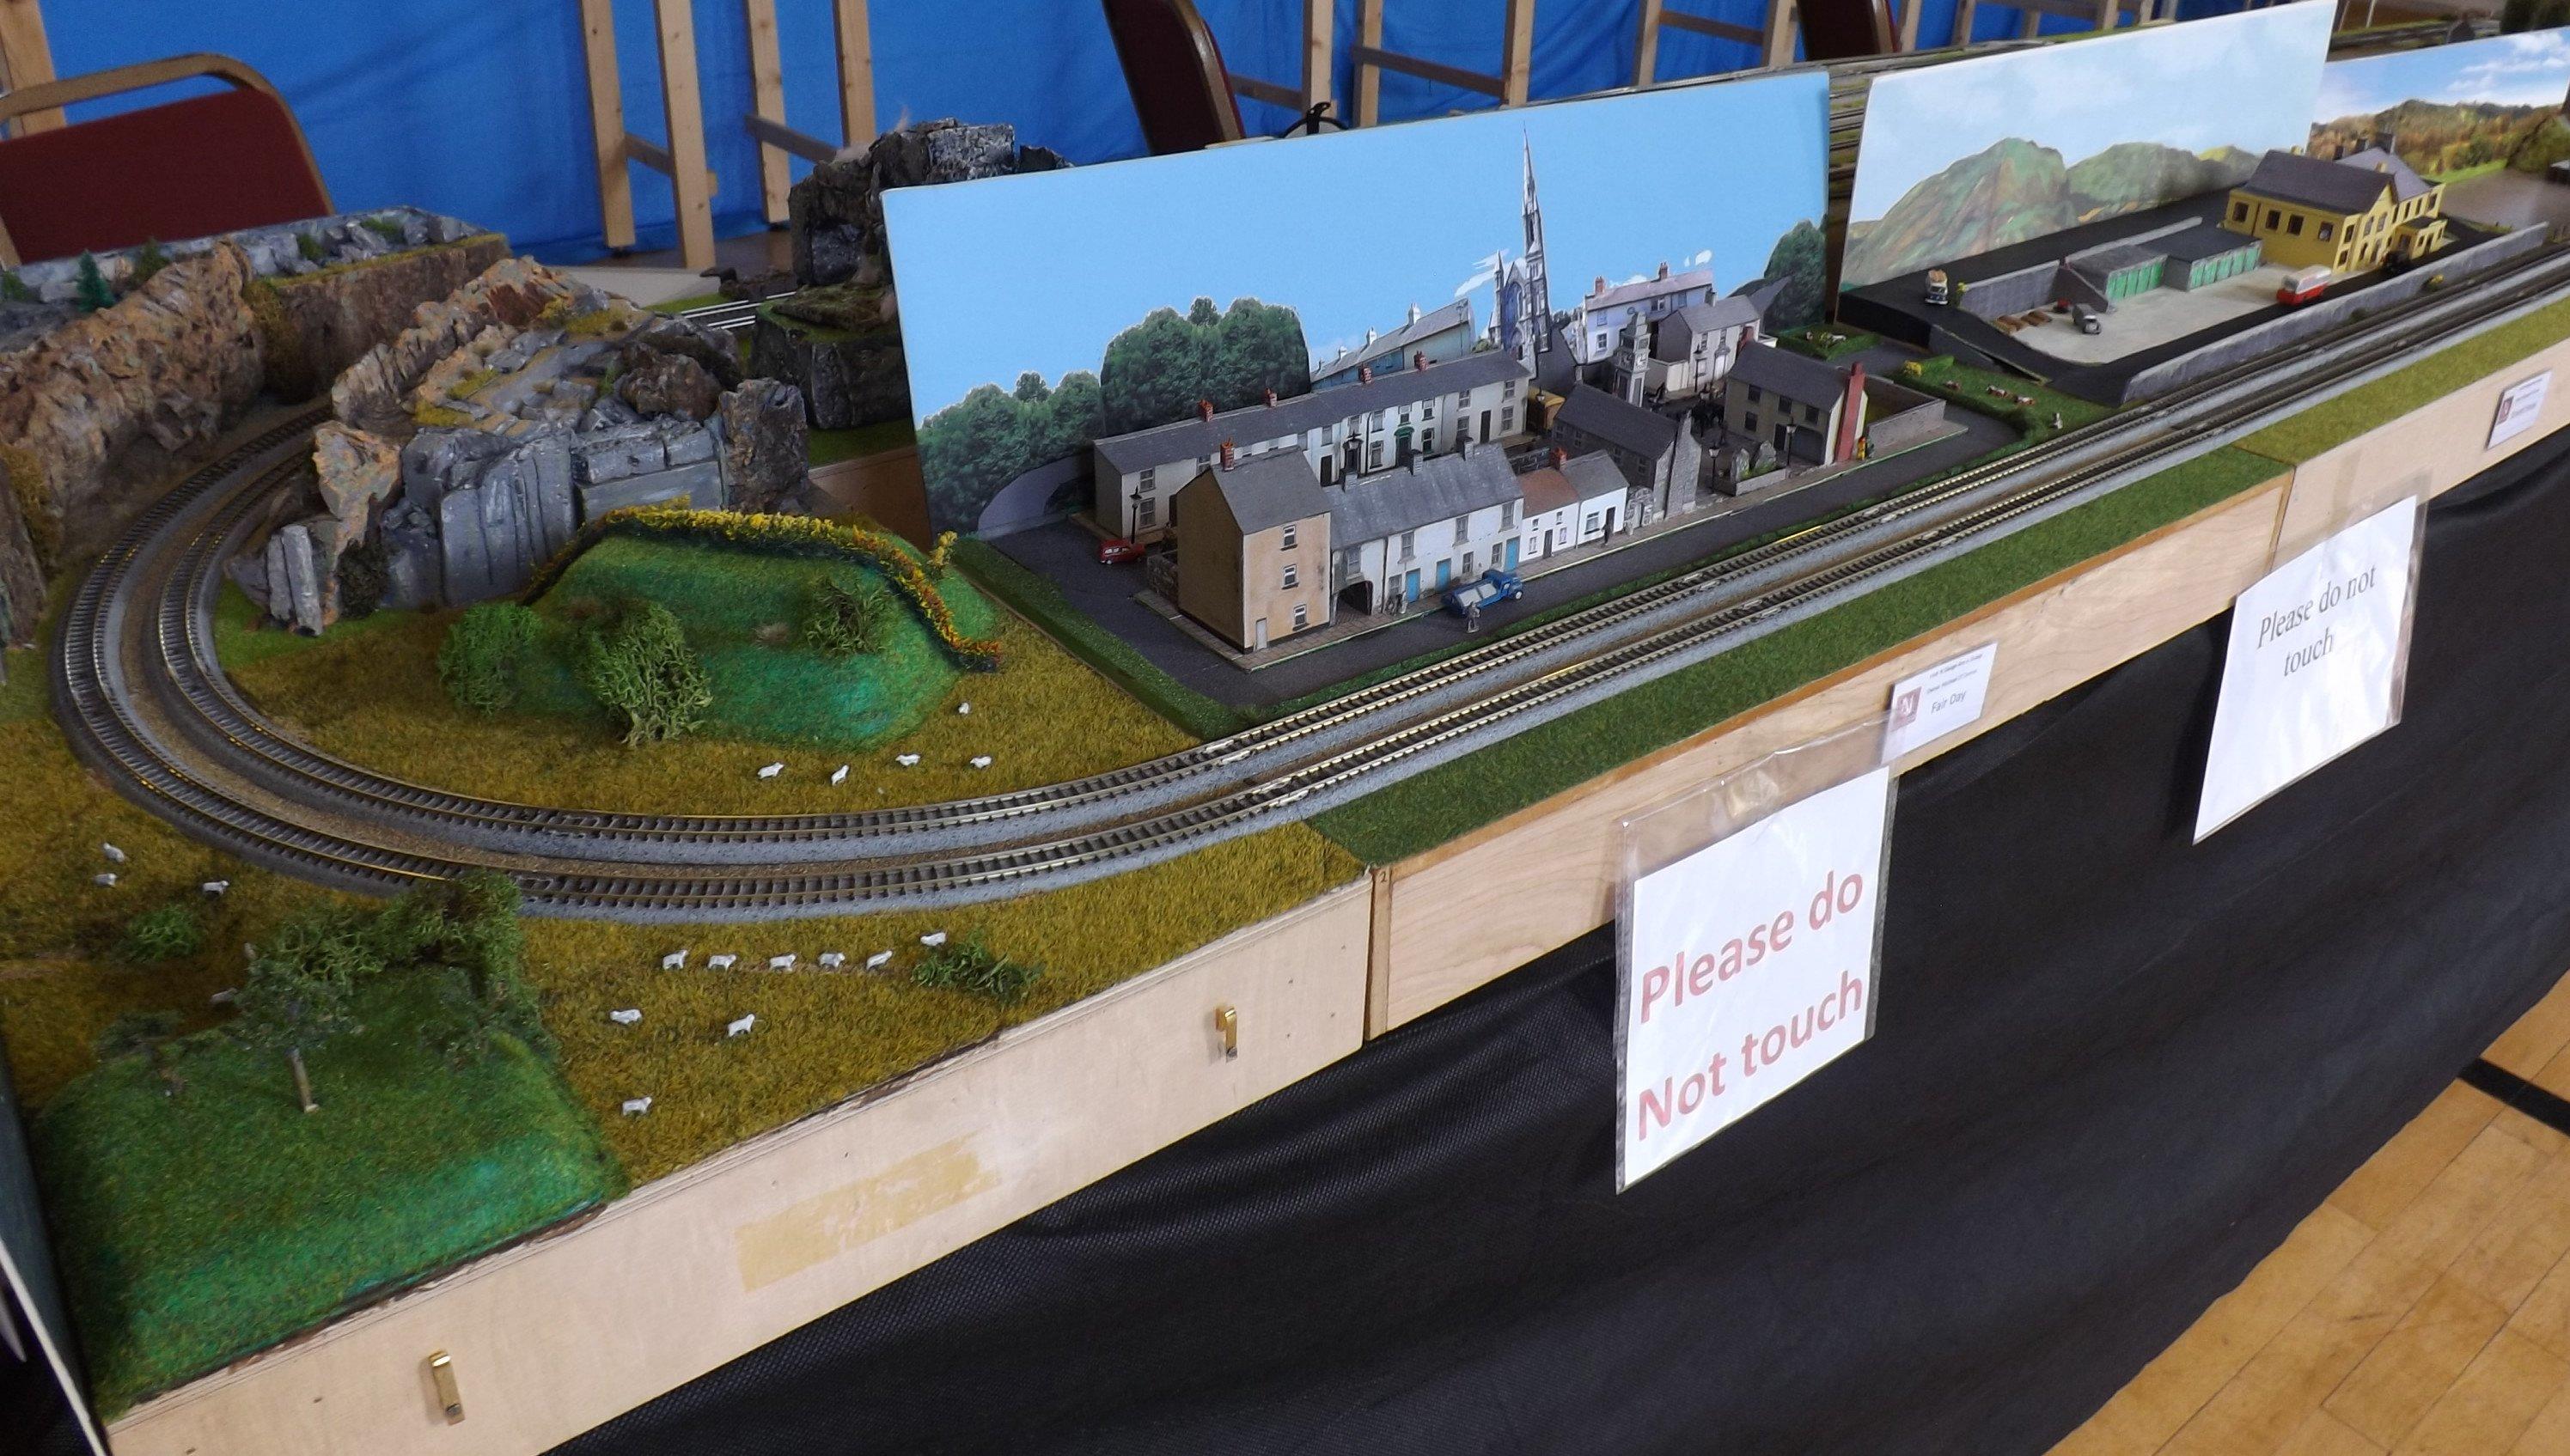 N Gauge T-Trak - Page 2 - Irish Model Layouts - Irish Railway Modeller